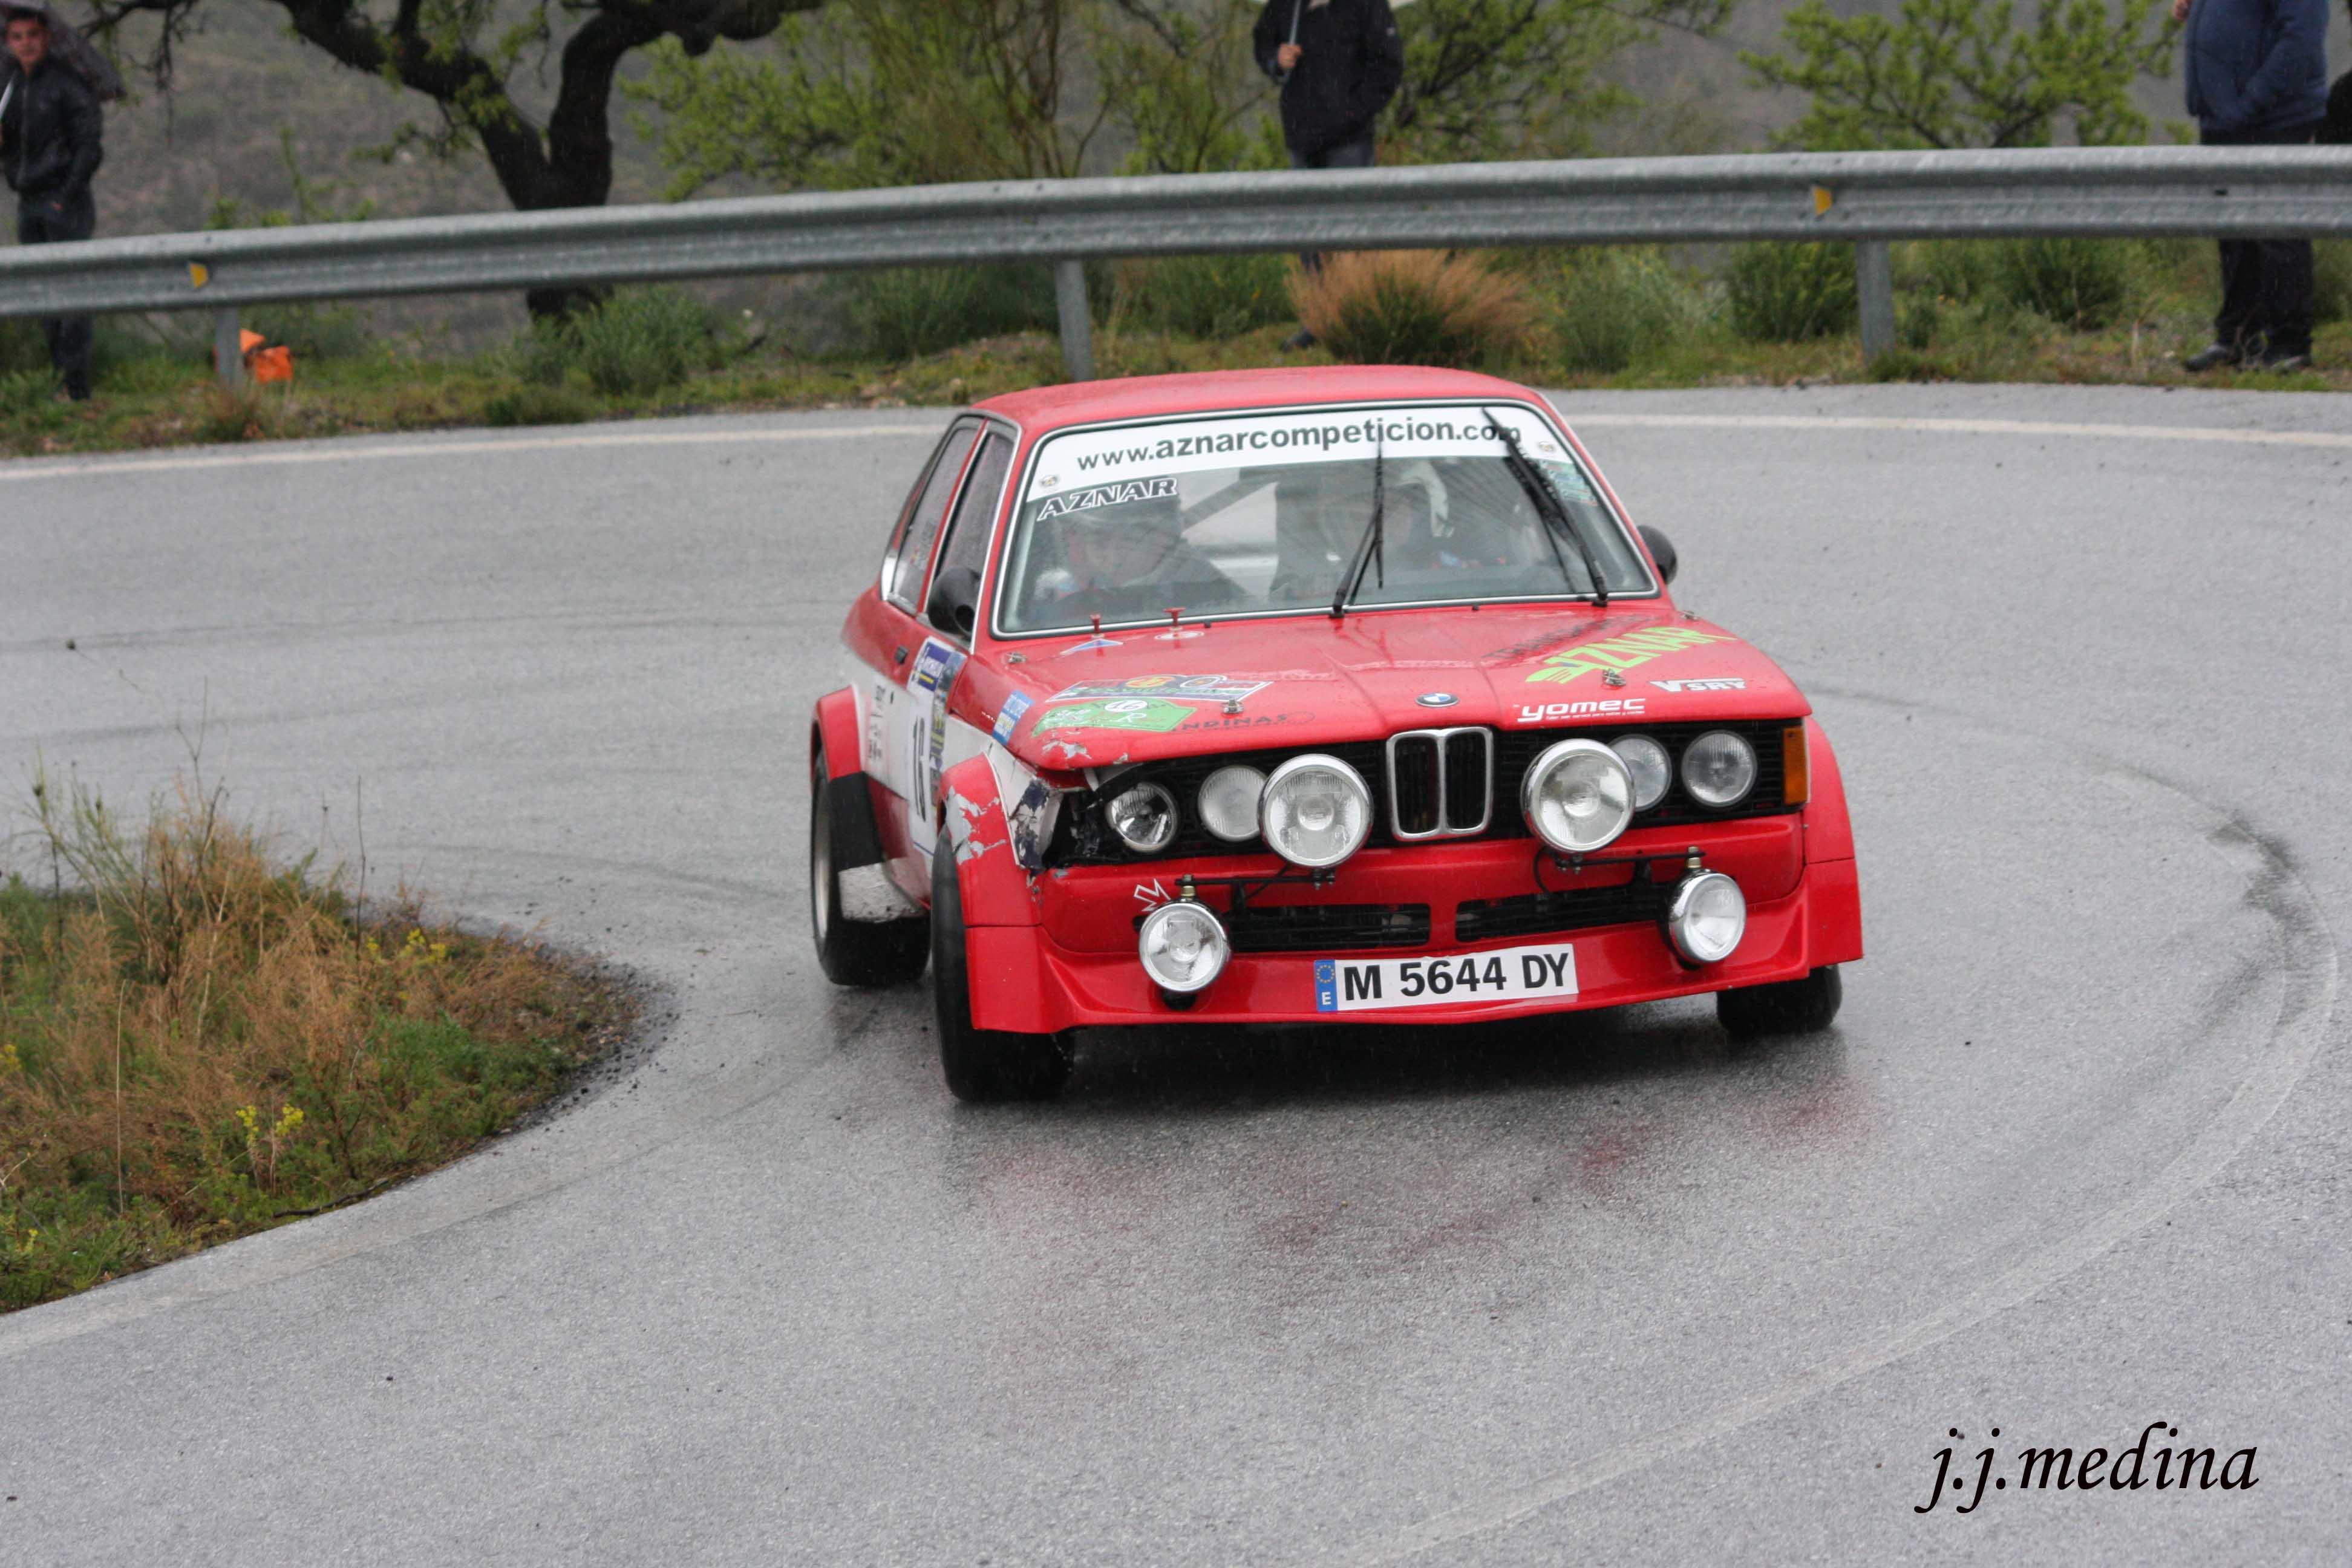 15 Campeones Andaluces De Rallyes La P 225 Gina De Motor De